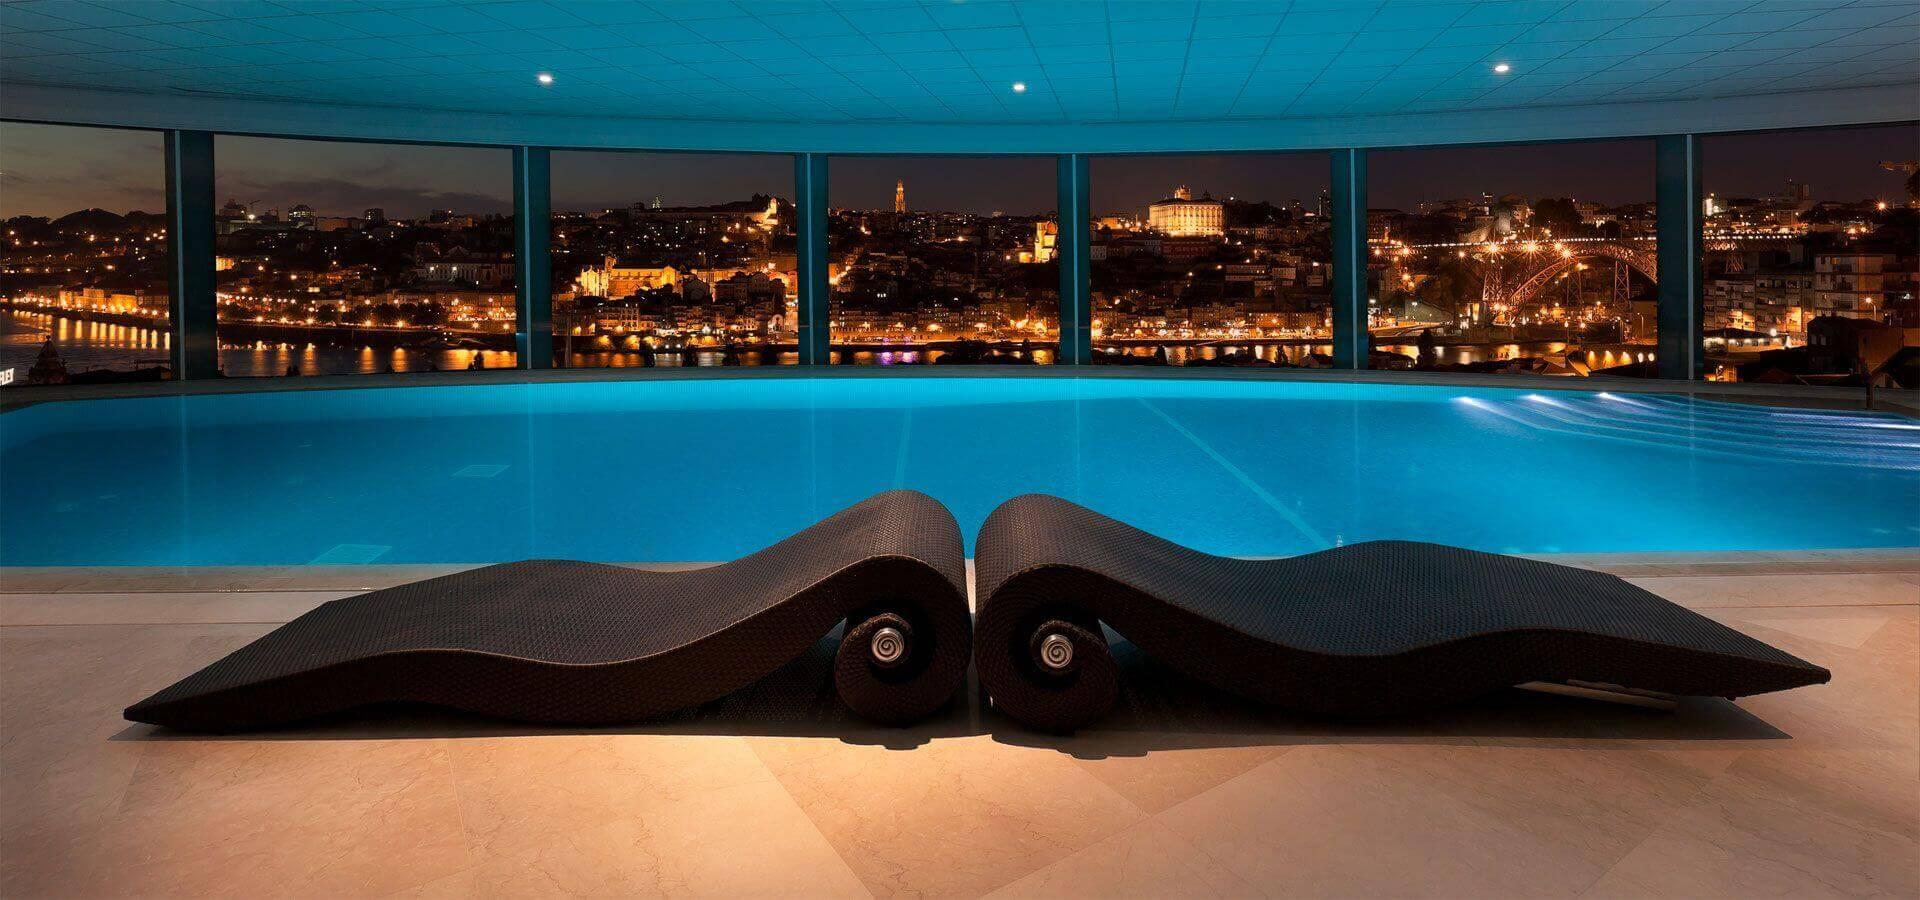 luxury_hotel_yeatman_porto_36859728658da3dad52456_2932729445bed3091e4179_7889235865c1bbfcc74439.jpg